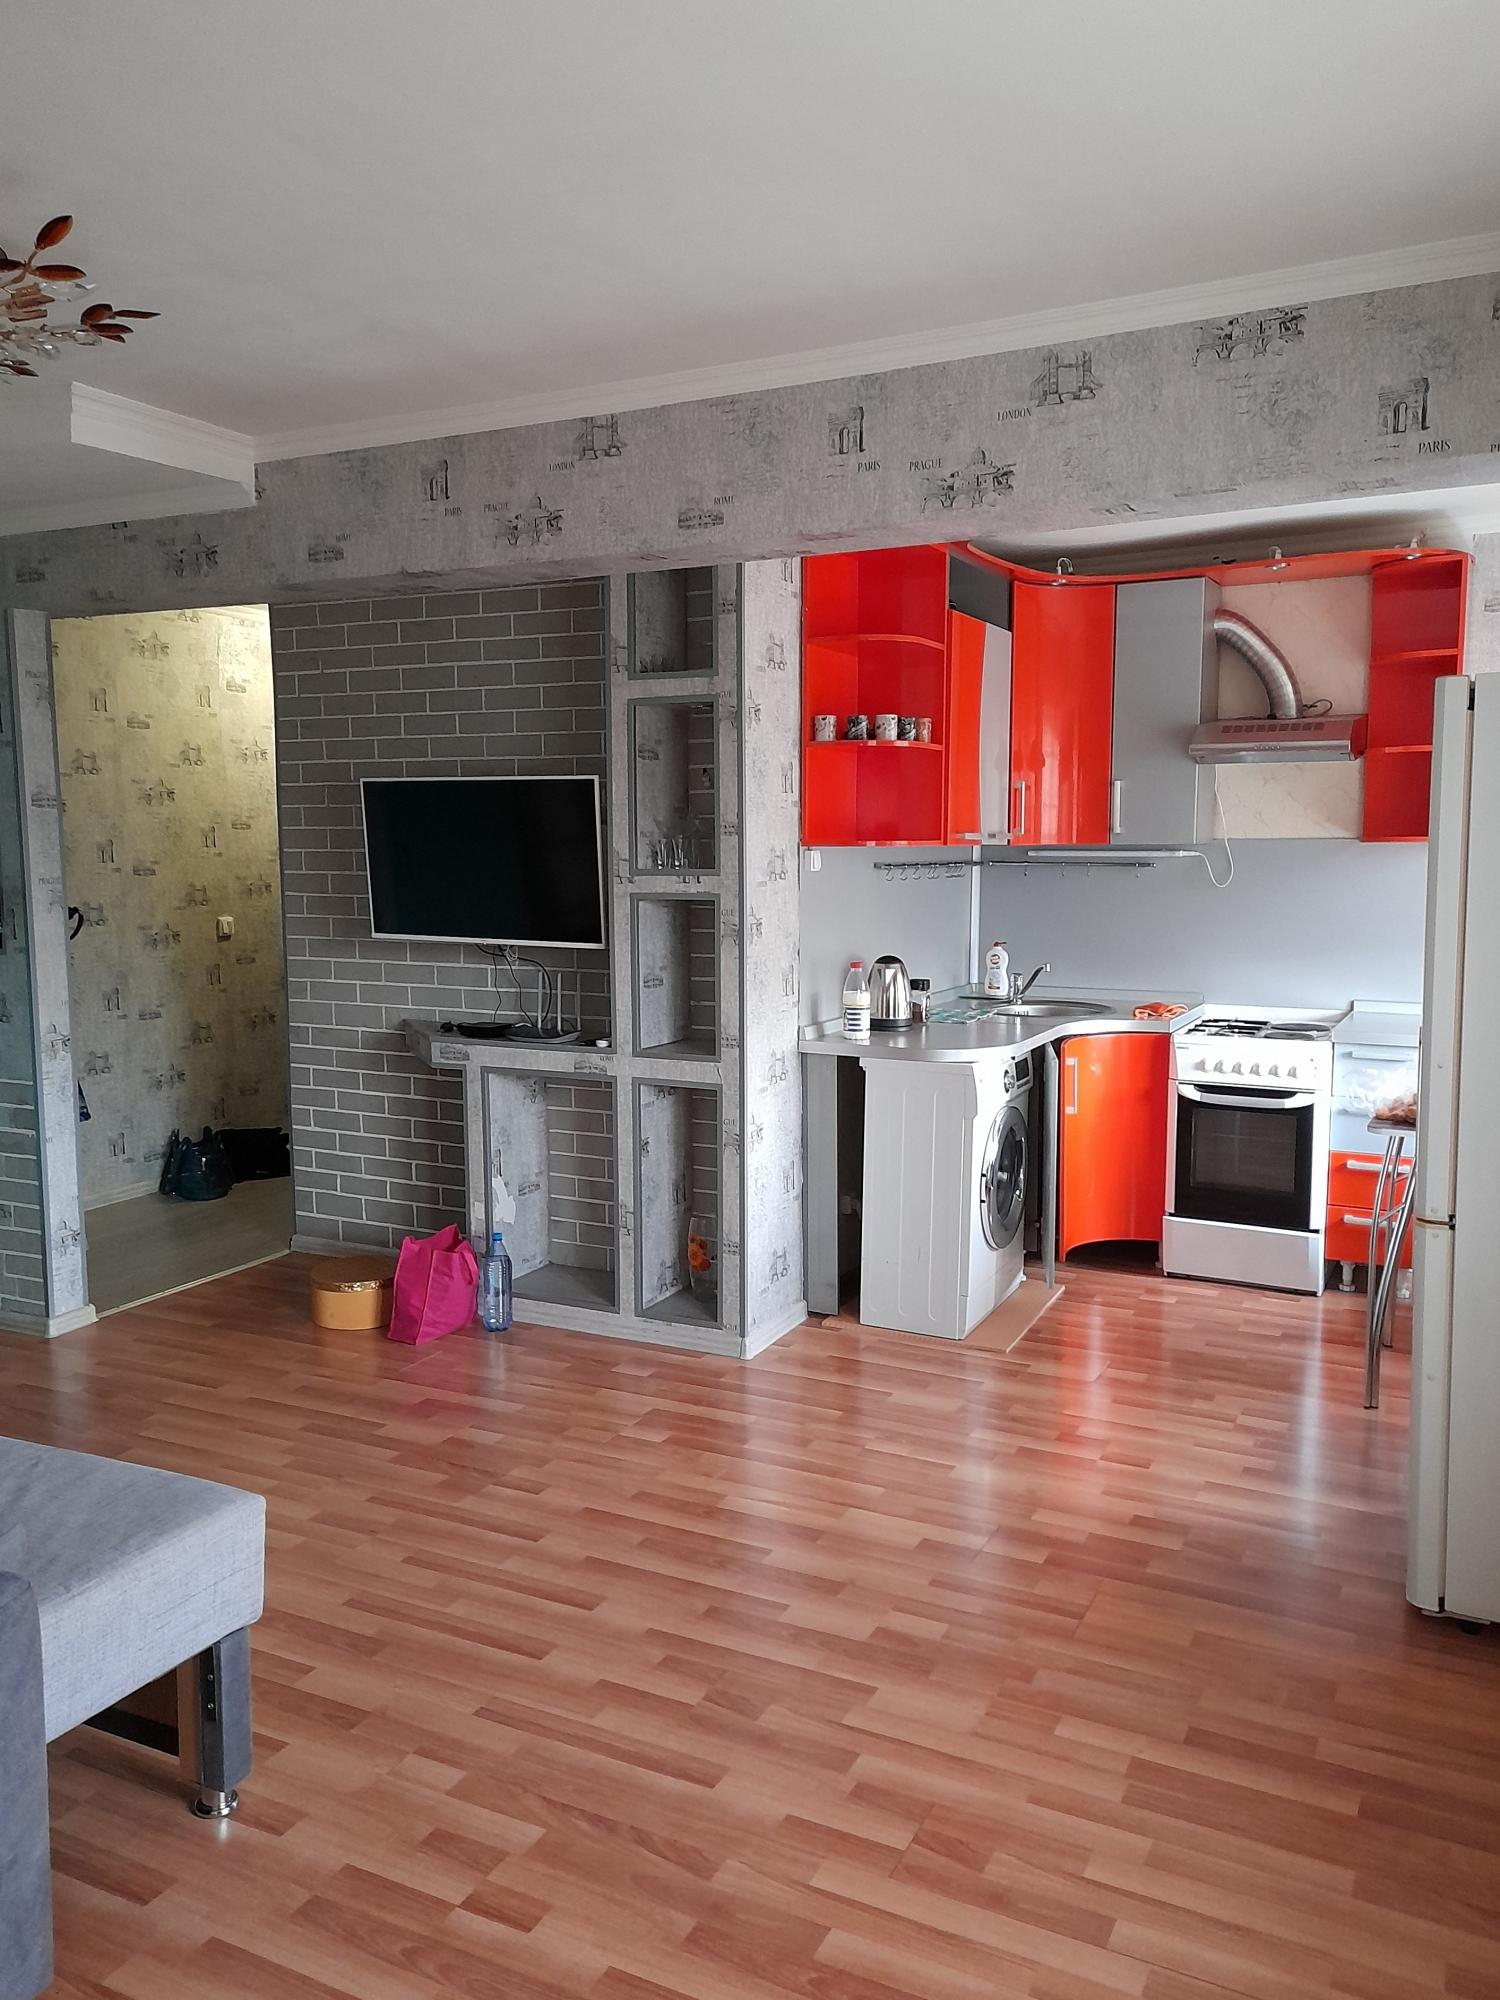 2к квартира Западная улица, 15 | 17000 | аренда в Красноярске фото 1